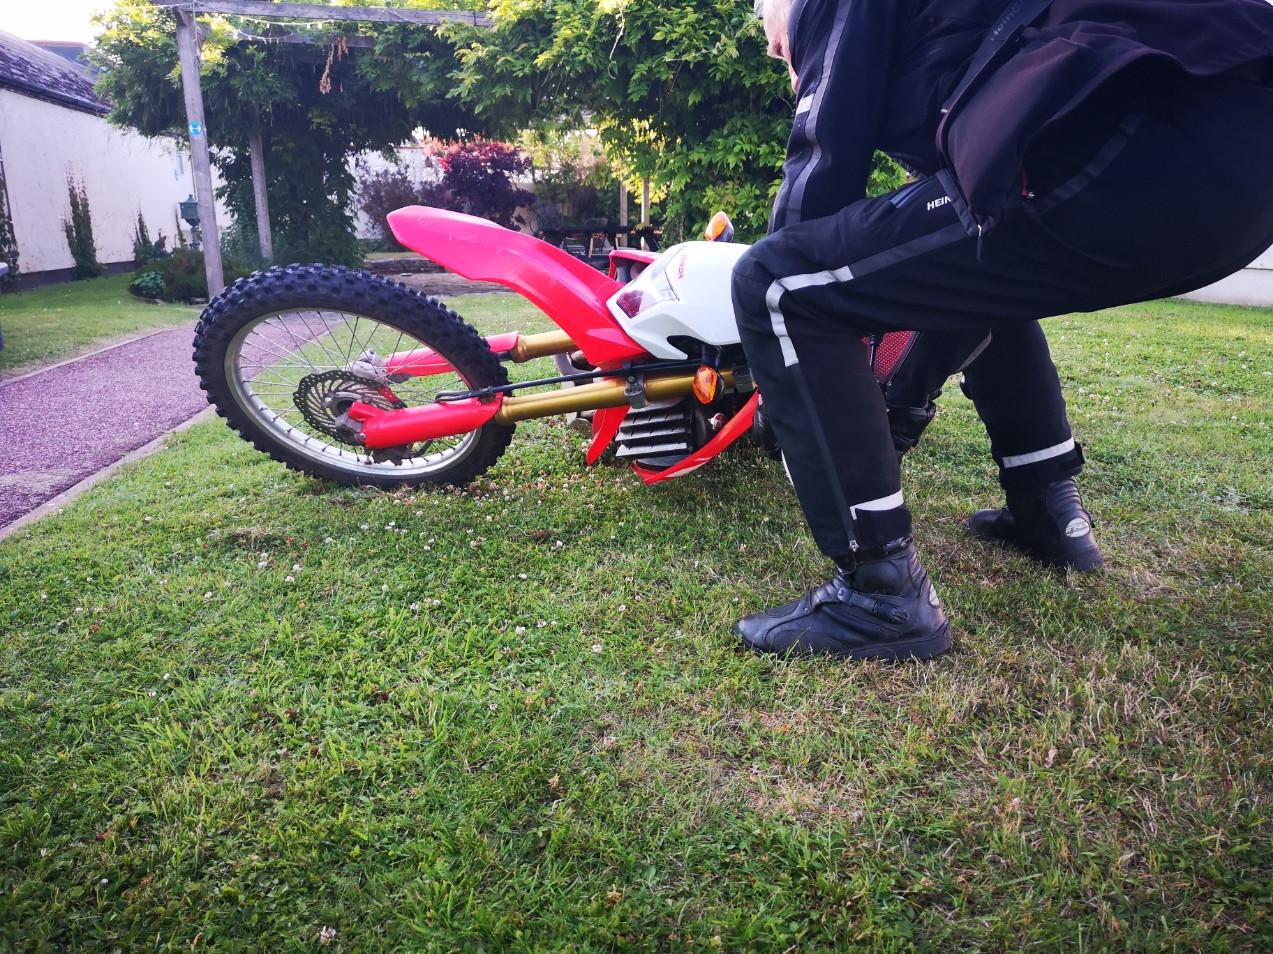 DAM Slow Riding Training